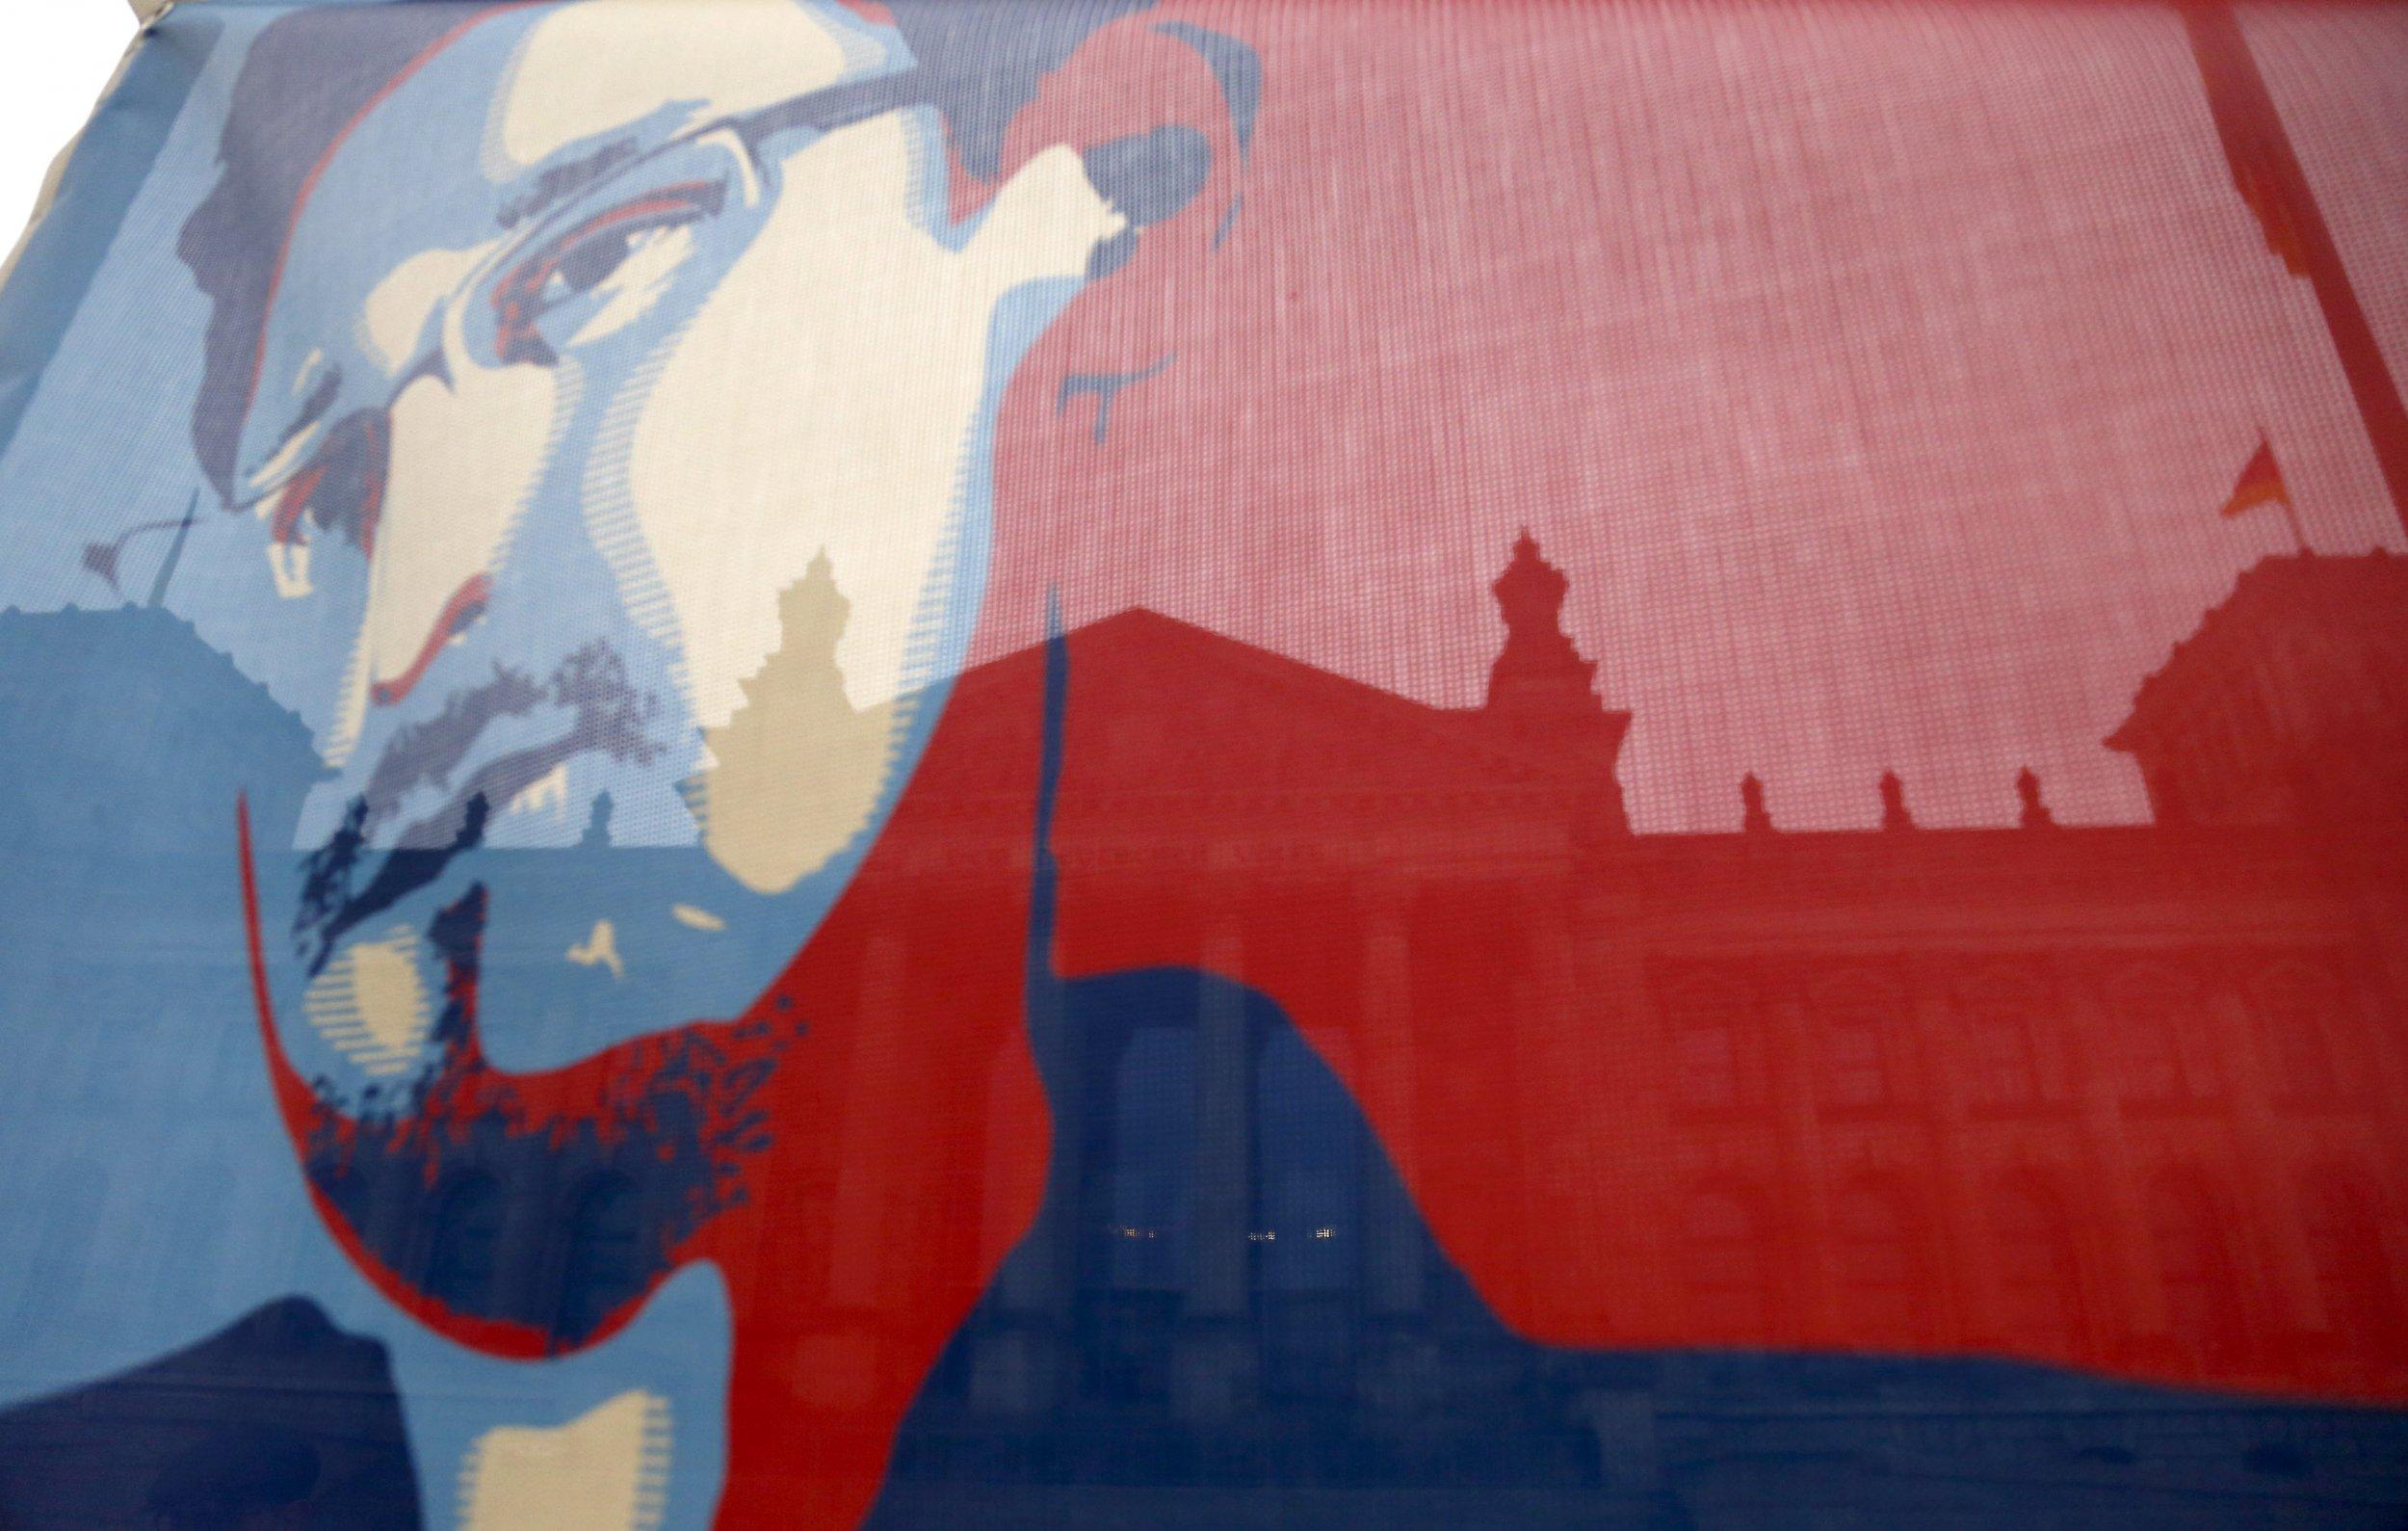 Edward Snowden in Russia